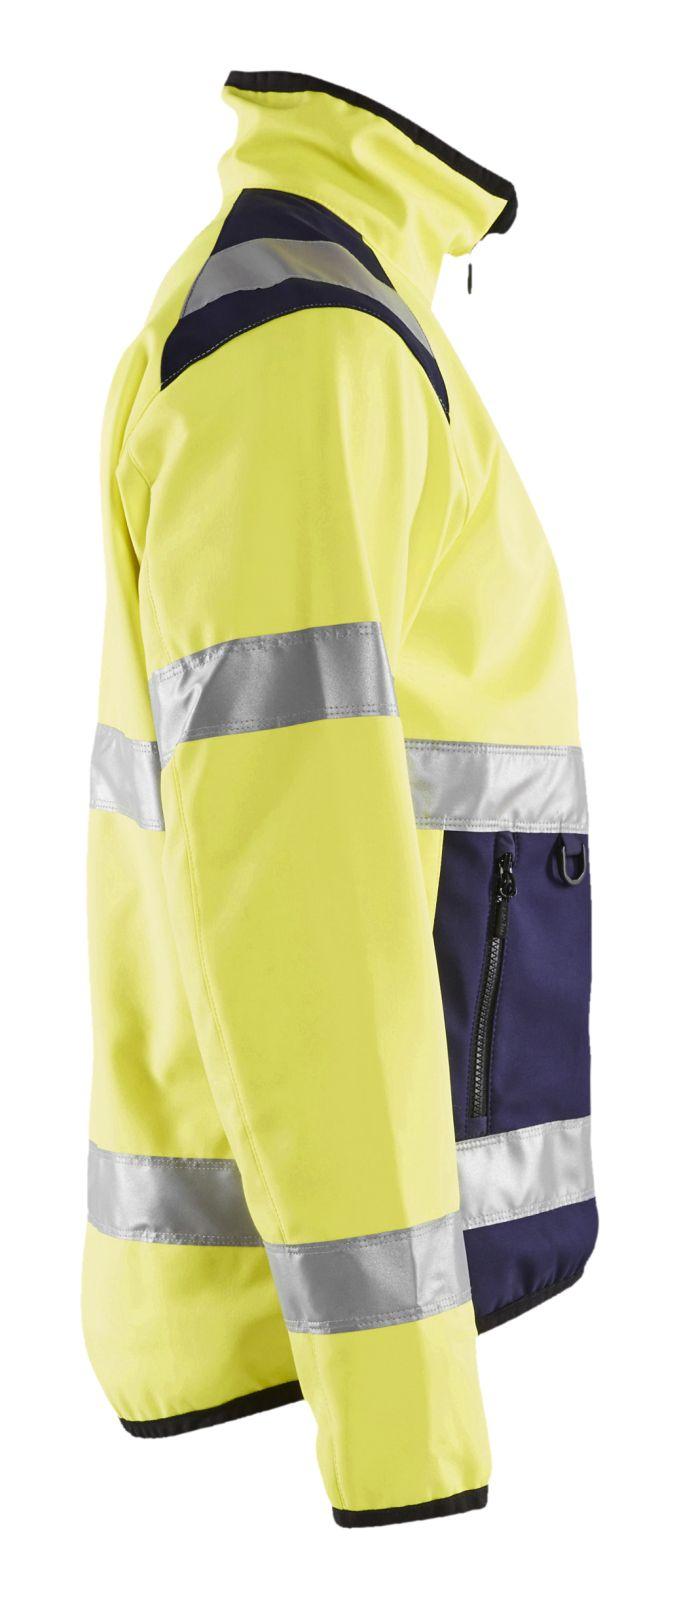 Blaklader Softshell jacks 48772516 High Vis geel-marineblauw(3389)